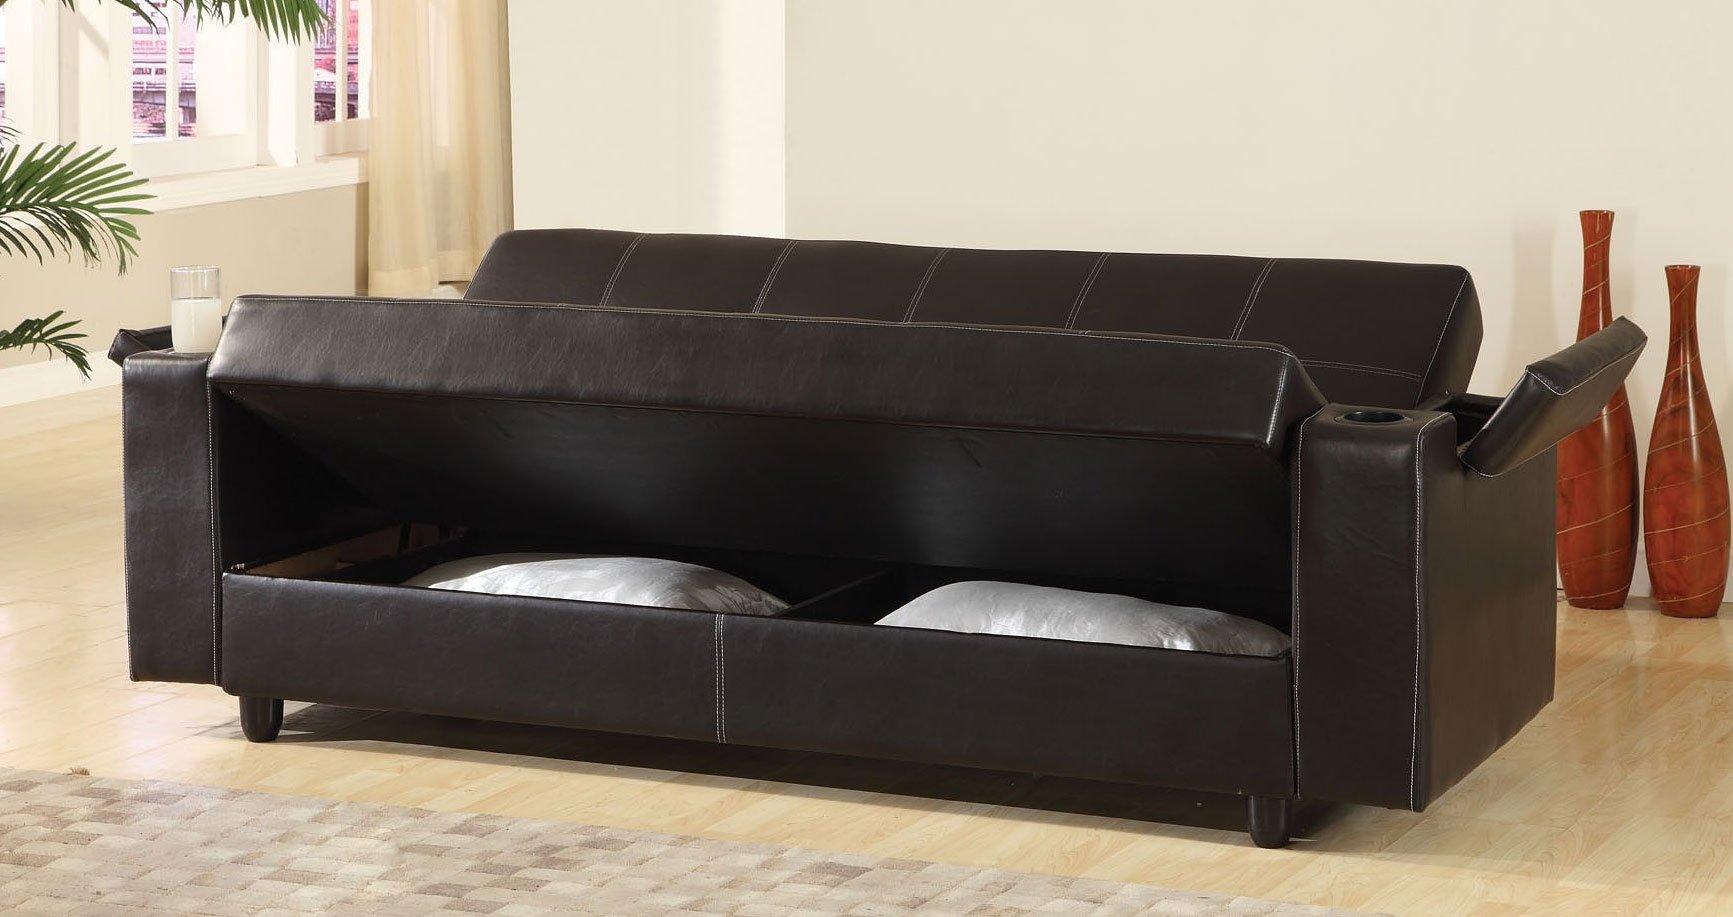 Sanya Sofa Bed W Storage And Cup Holders